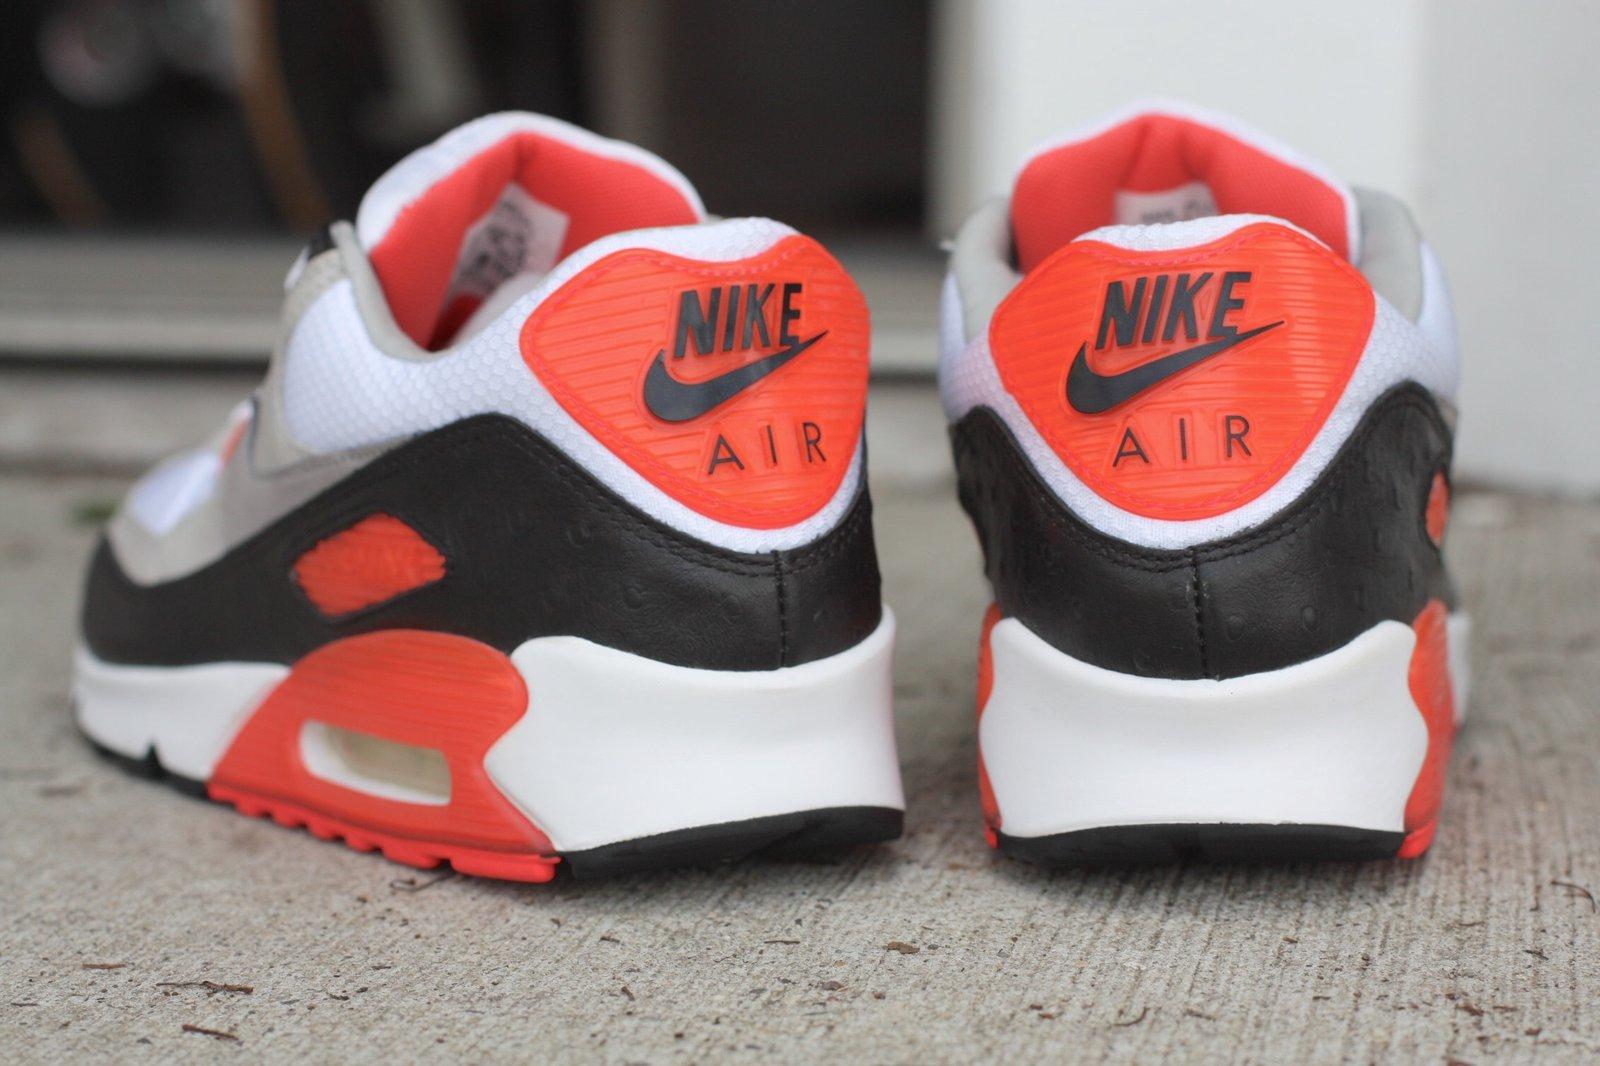 Nike Air Max 90 2013 Mesh Damen Kleiderkreisel